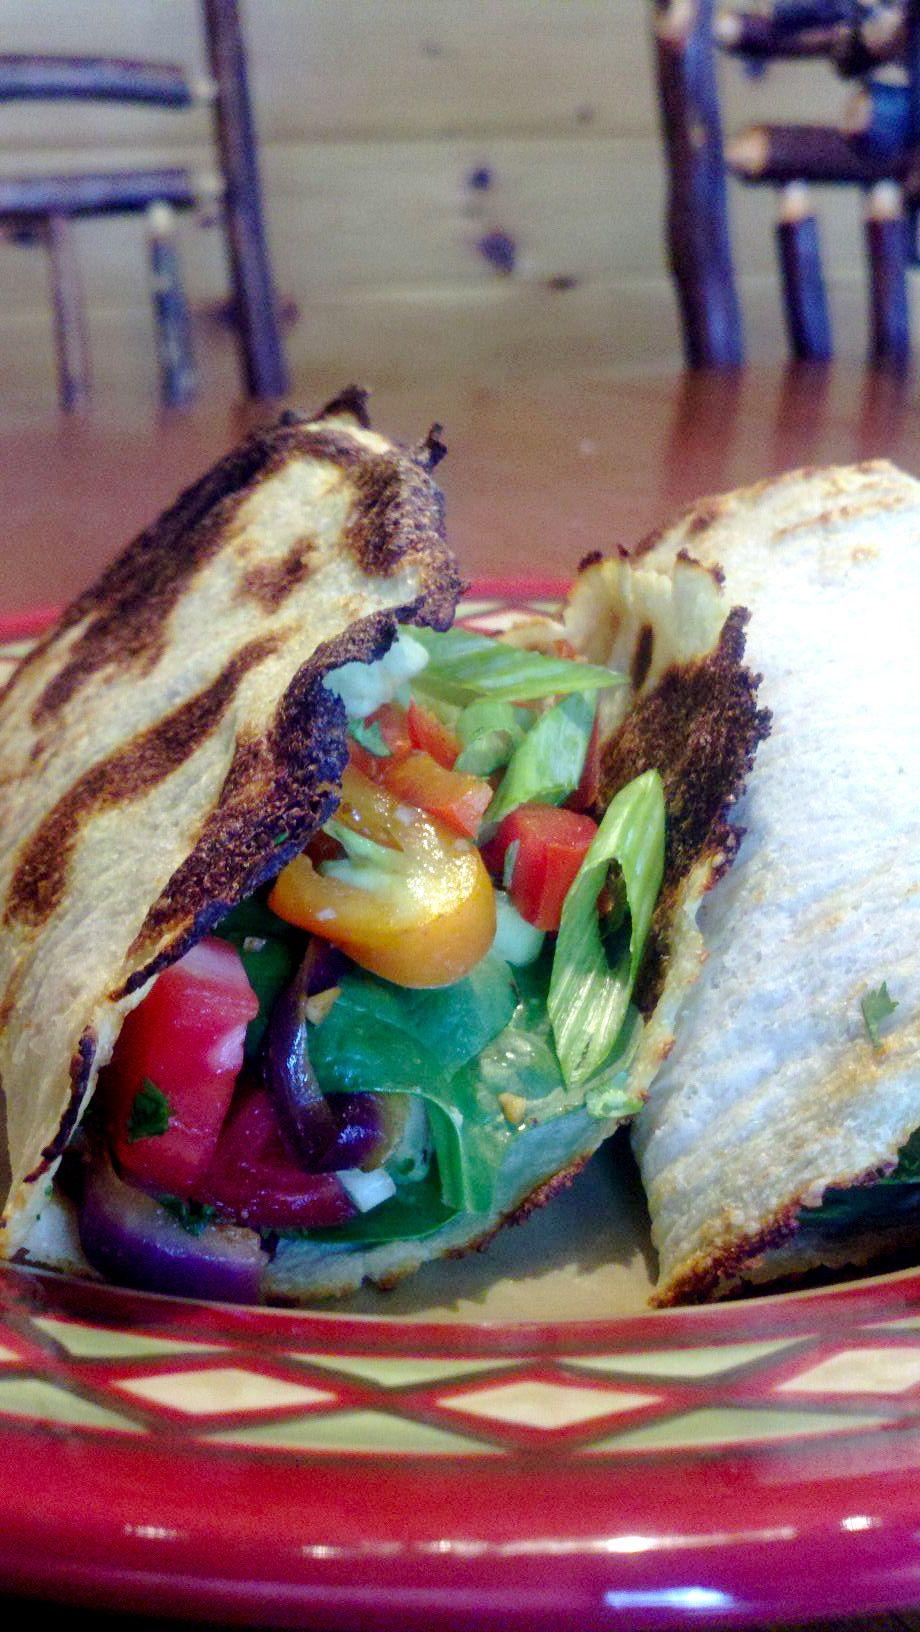 Cauliflower tortilla tacos - all veggies